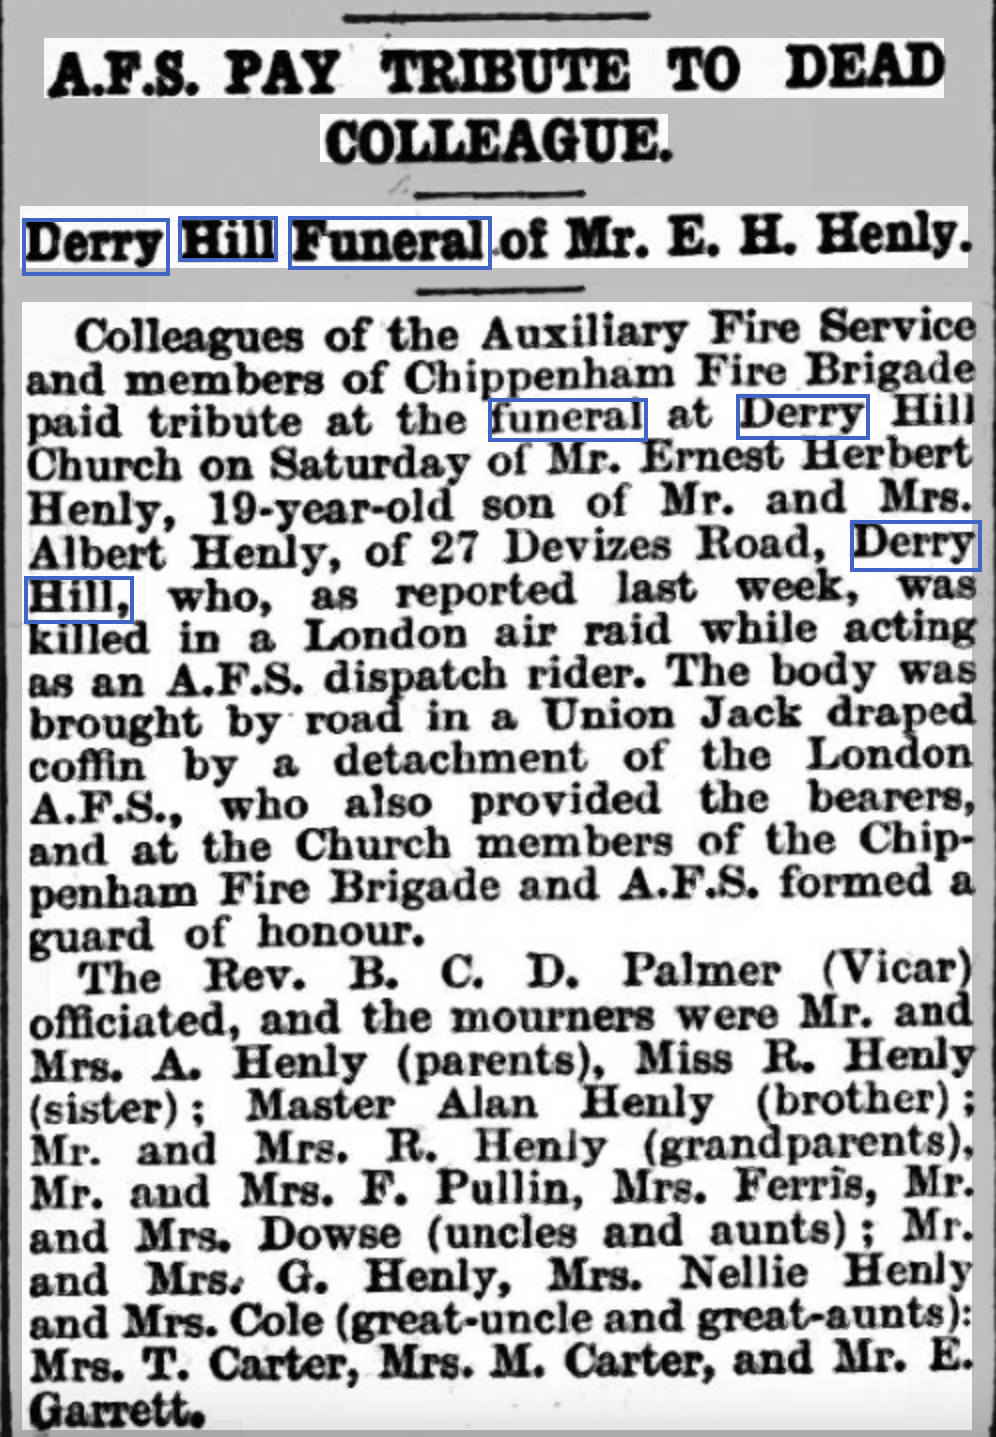 Ernest Henly's Funeral